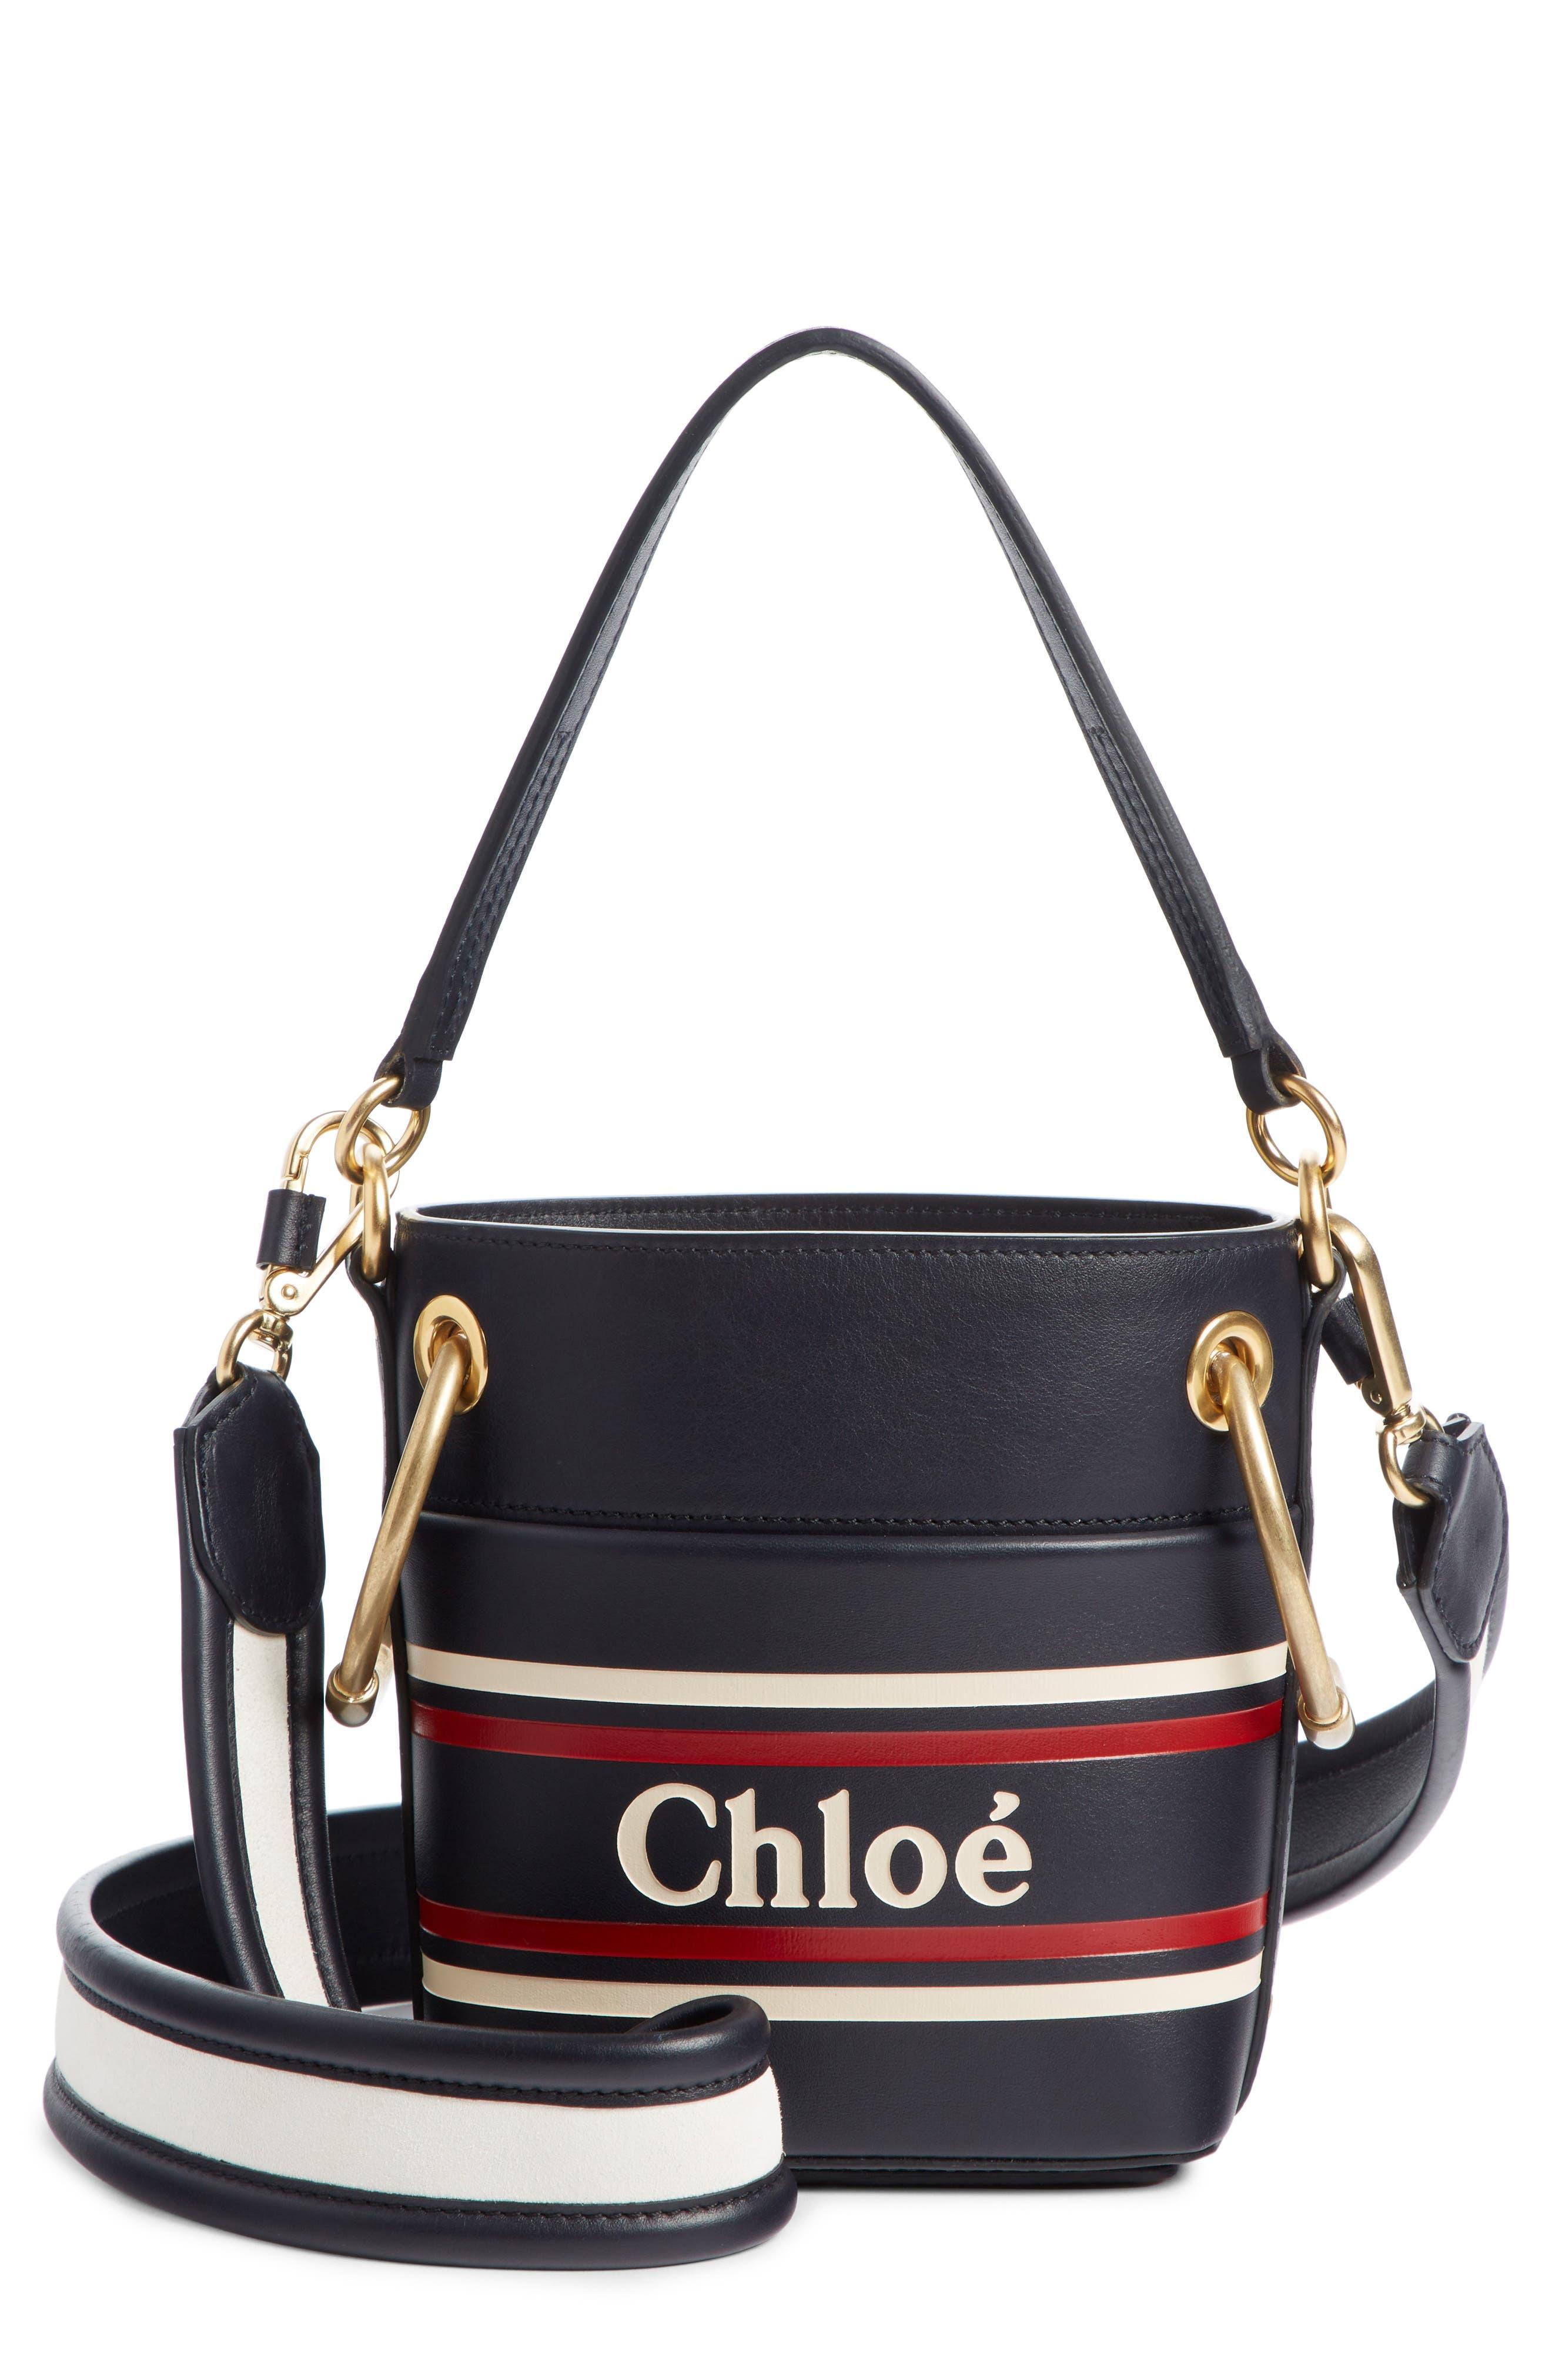 Chloe Small Roy Leather Bucket Bag Nordstrom Rack